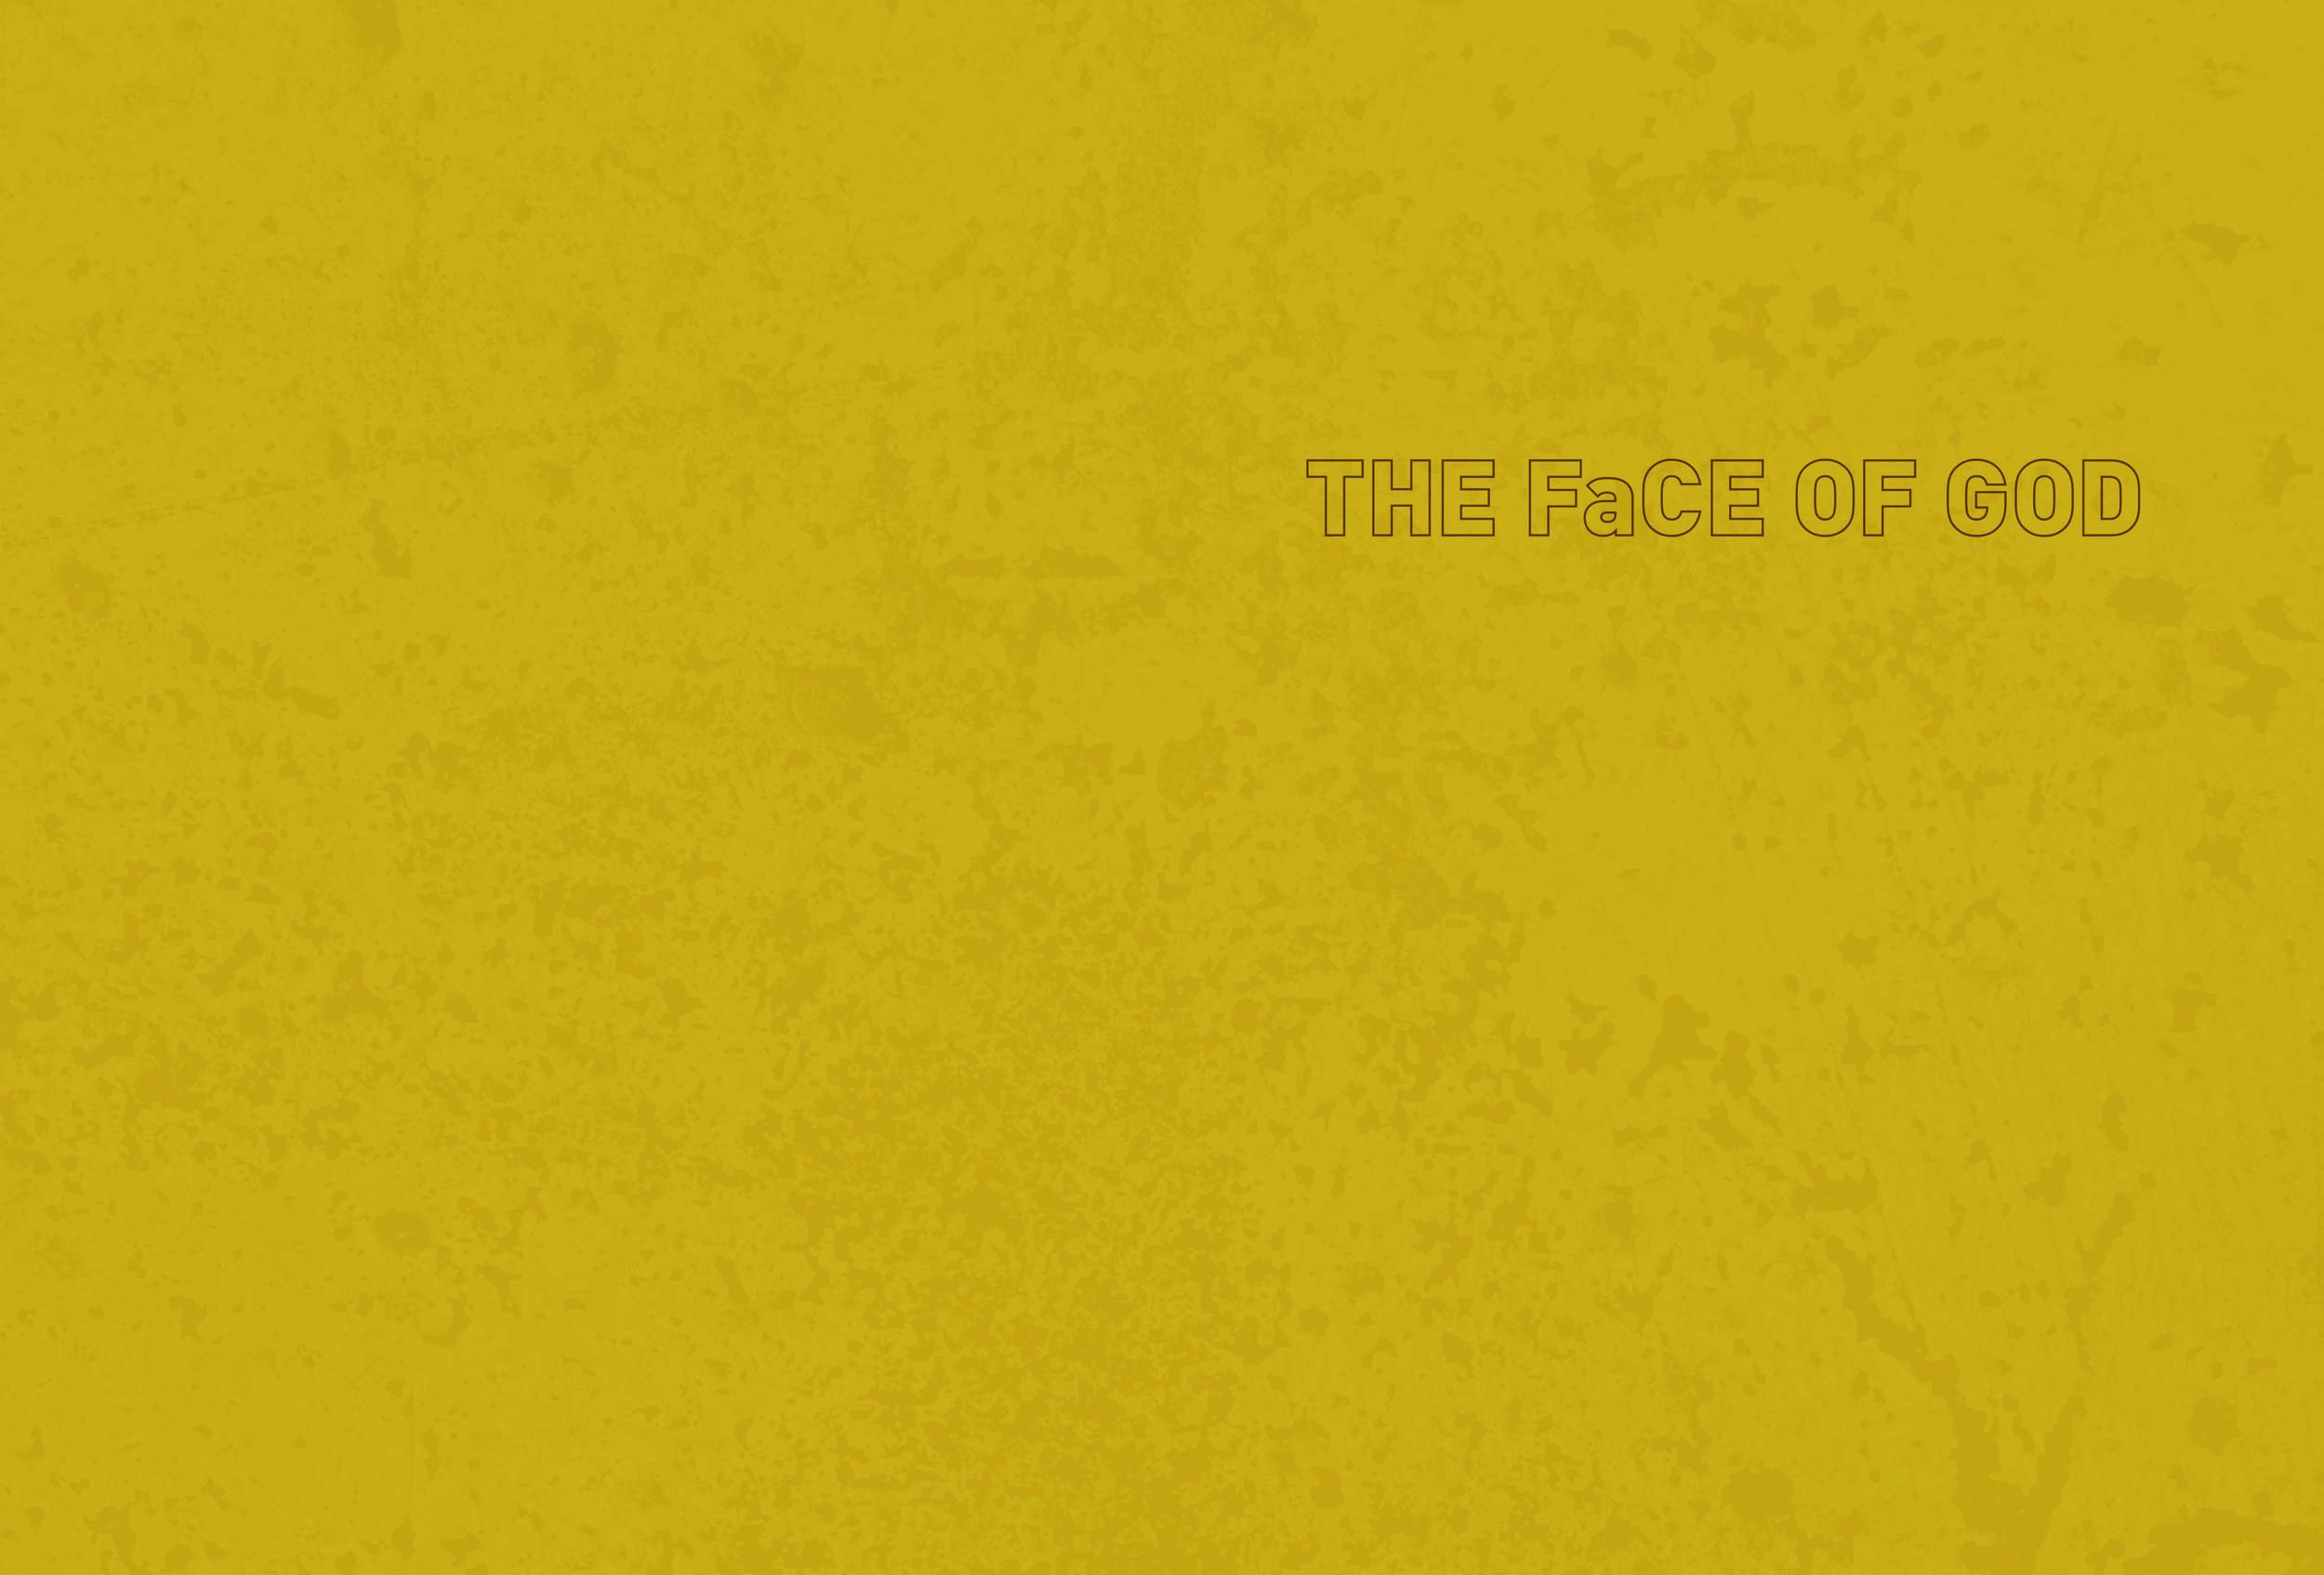 face of g.jpg